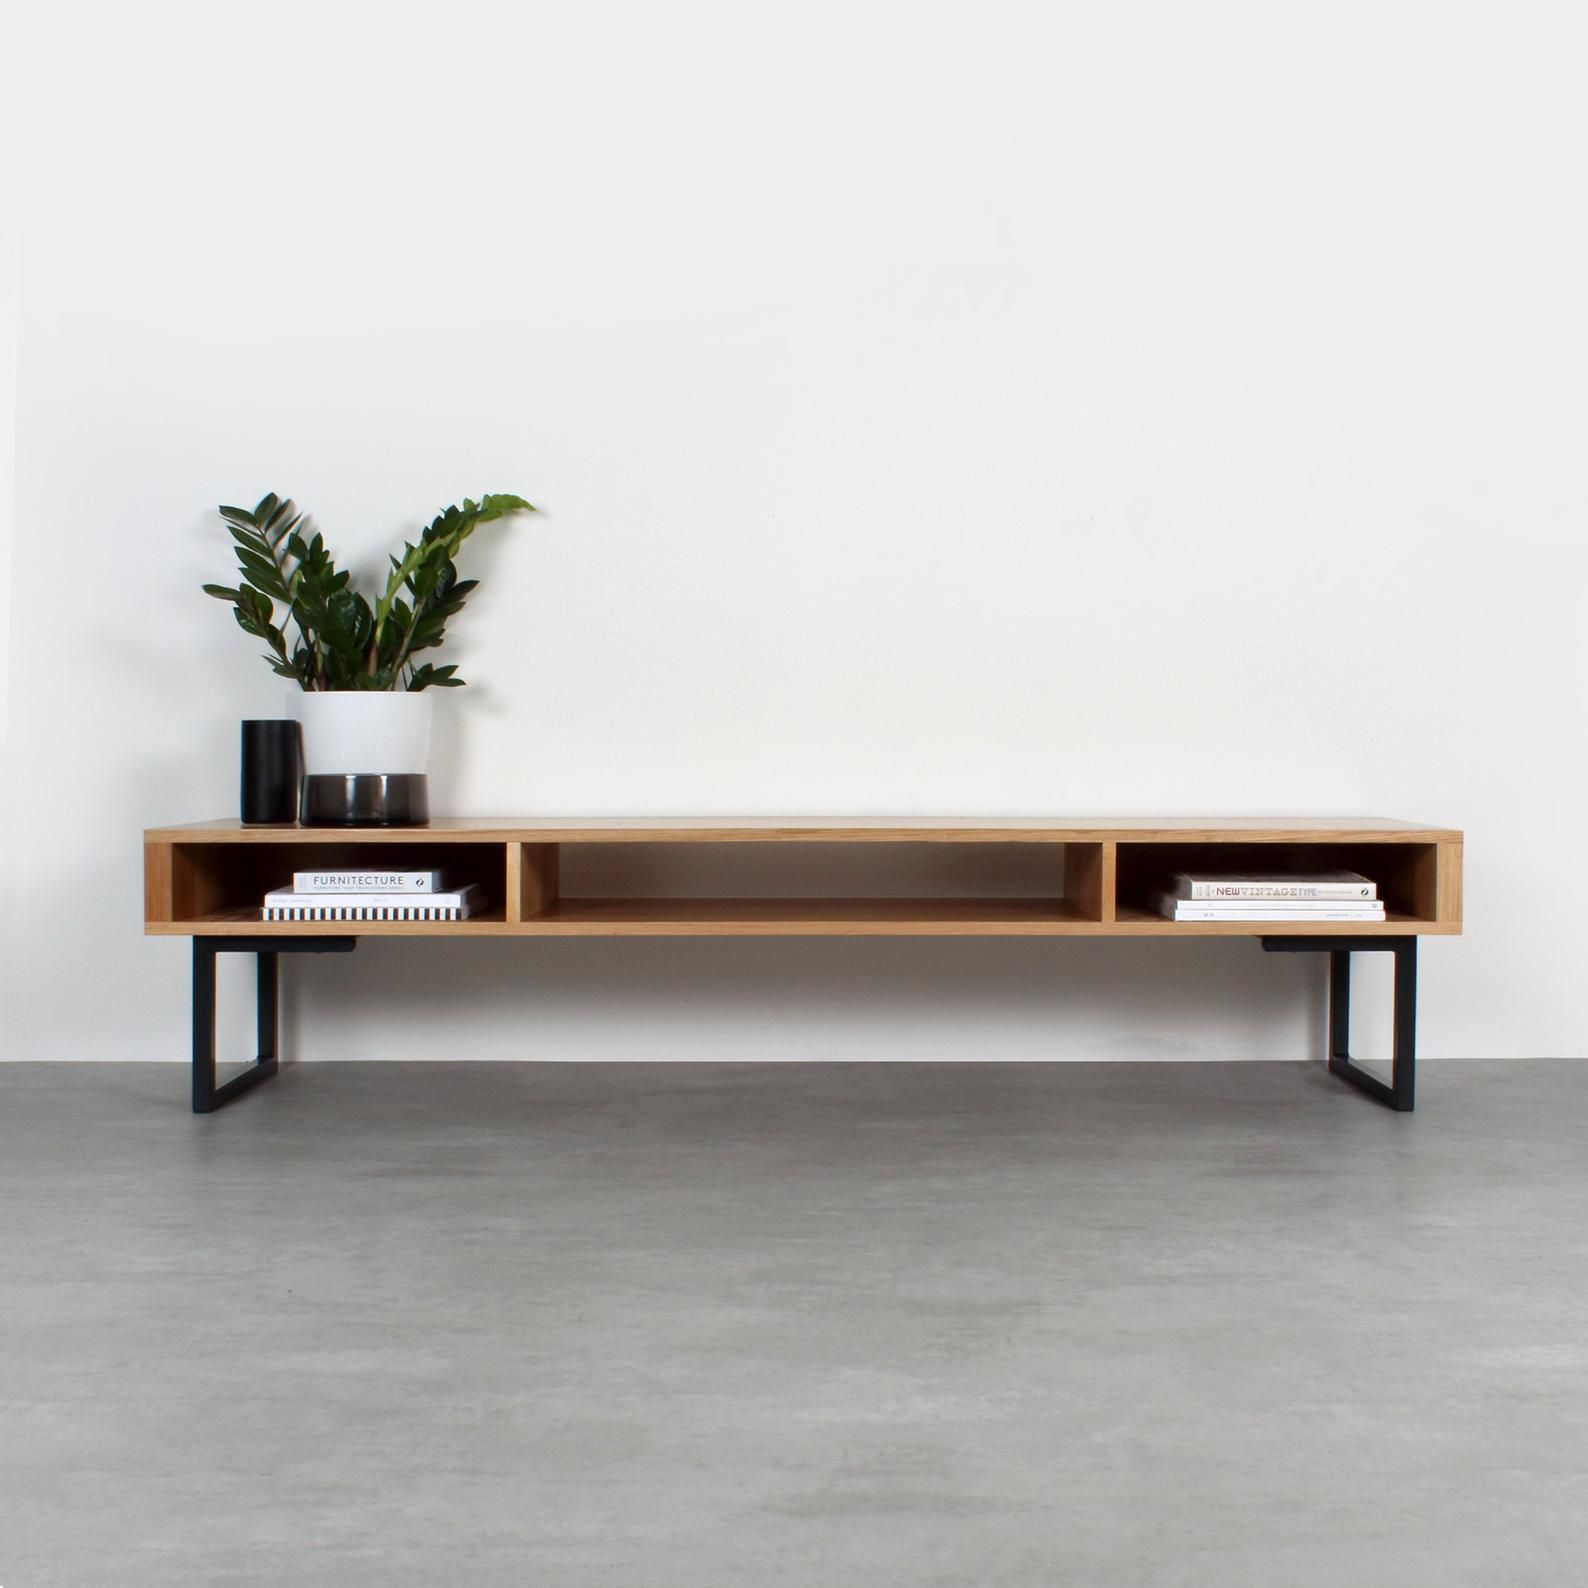 Extra Wide Solid Oak Tv Stand Or Coffee Table Minimalist Low Etsy Sofa Para Sala Pequena Salas Industriais Ideias Para Mobilia